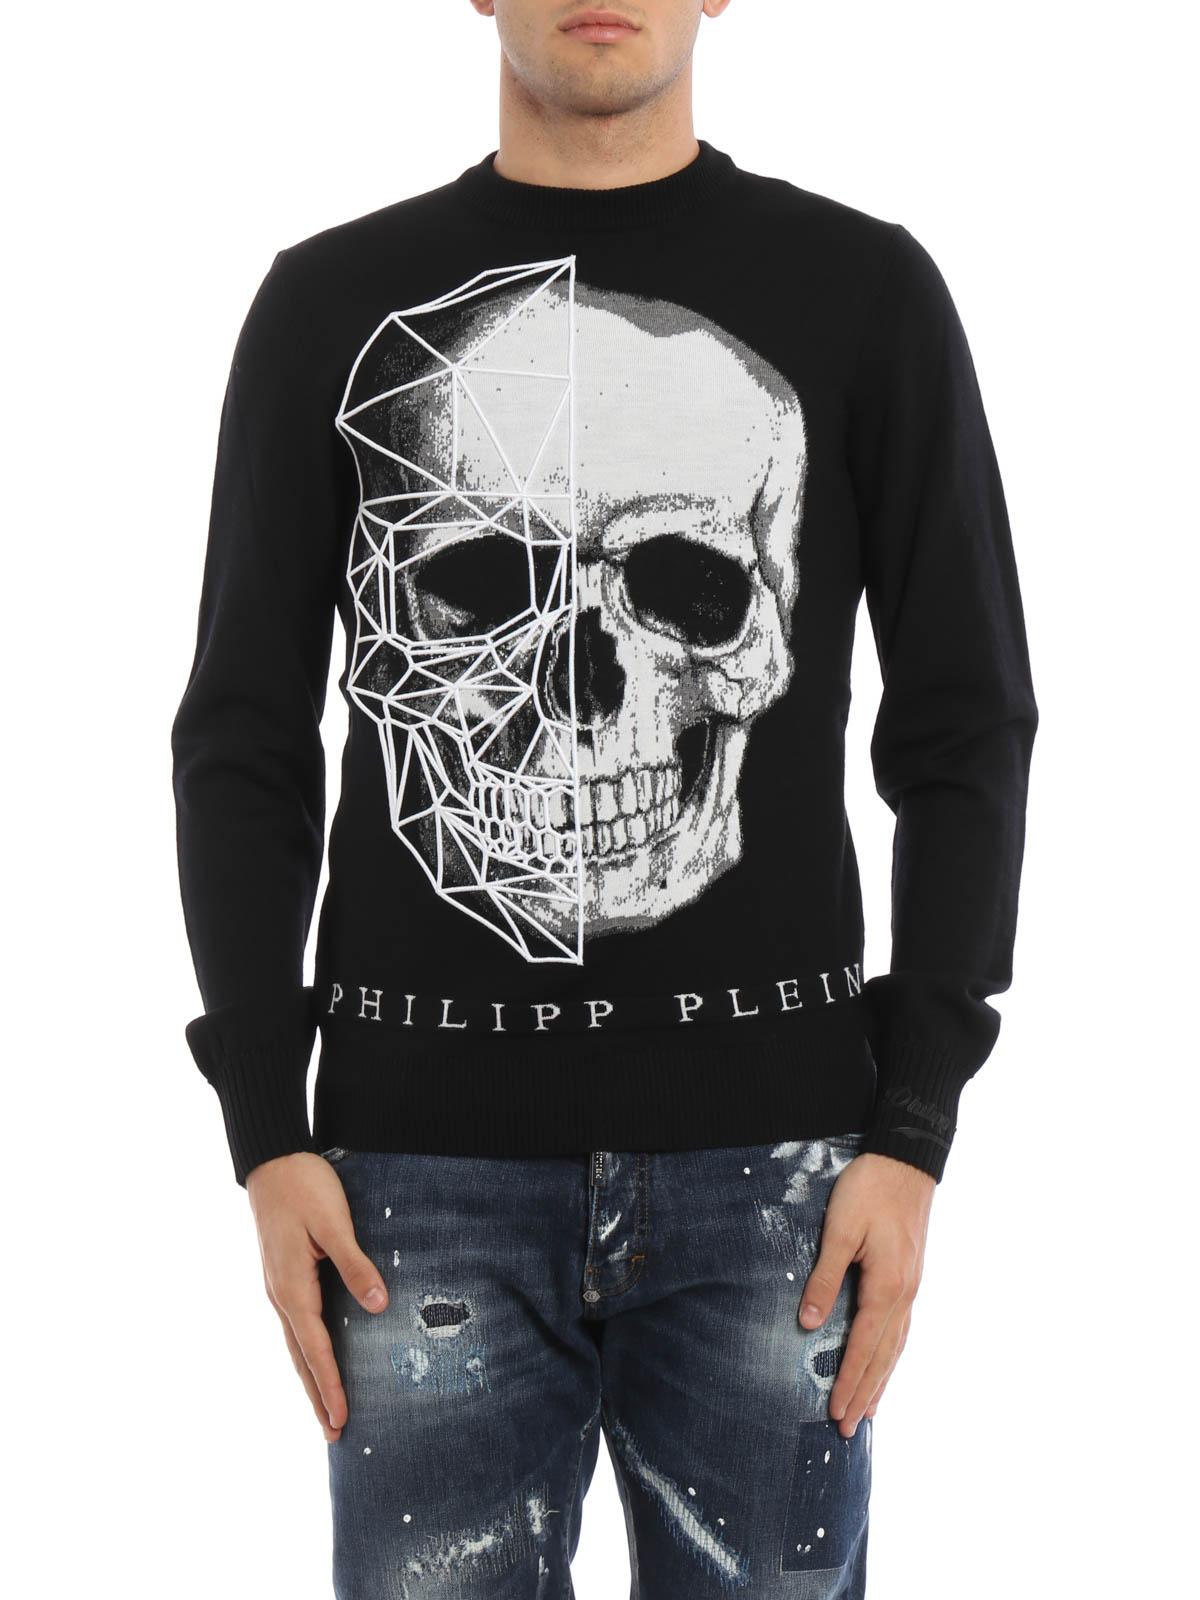 diamonds embroidered skull sweater by philipp plein crew. Black Bedroom Furniture Sets. Home Design Ideas